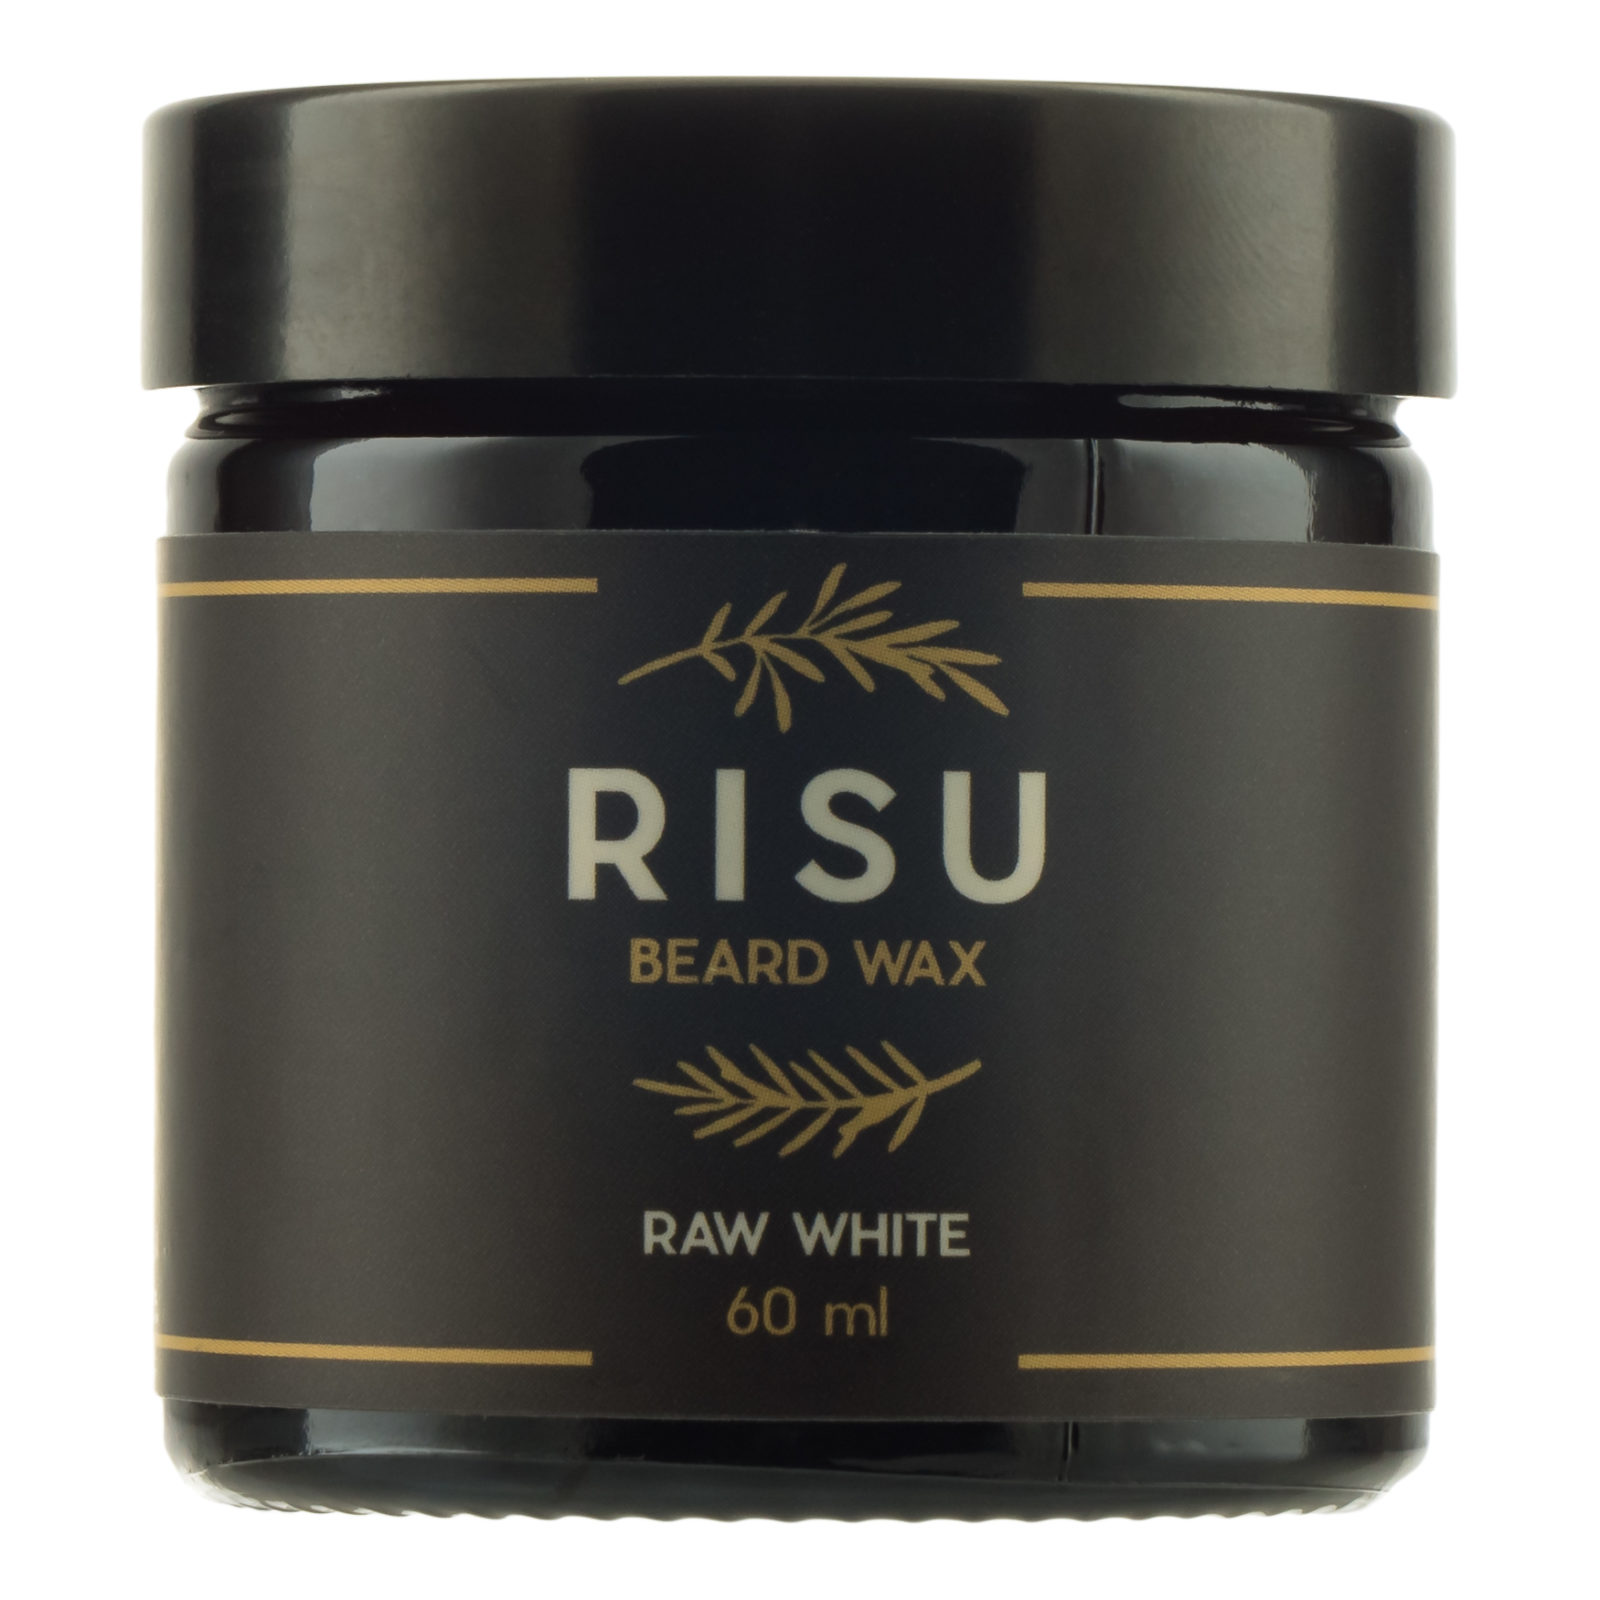 Tuotekuva: Risu Raw White Beard Wax (60 ml) -tuoksuton partavaha